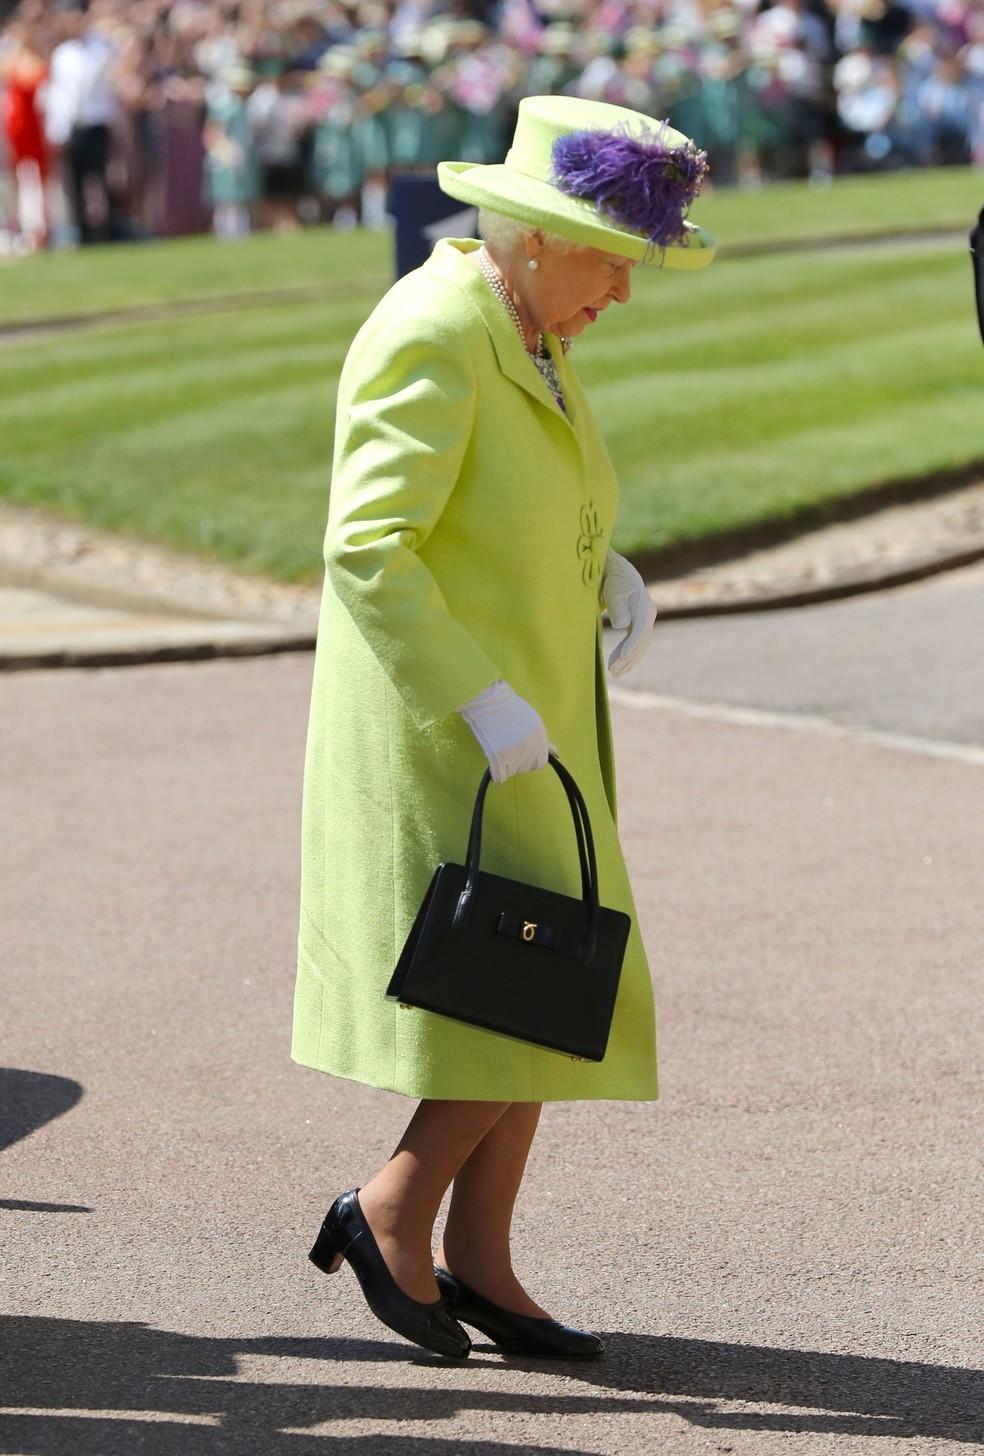 Rainha Elizabeth II chega ao casamento  (Foto: Gareth Fuller/Pool via REUTERS)